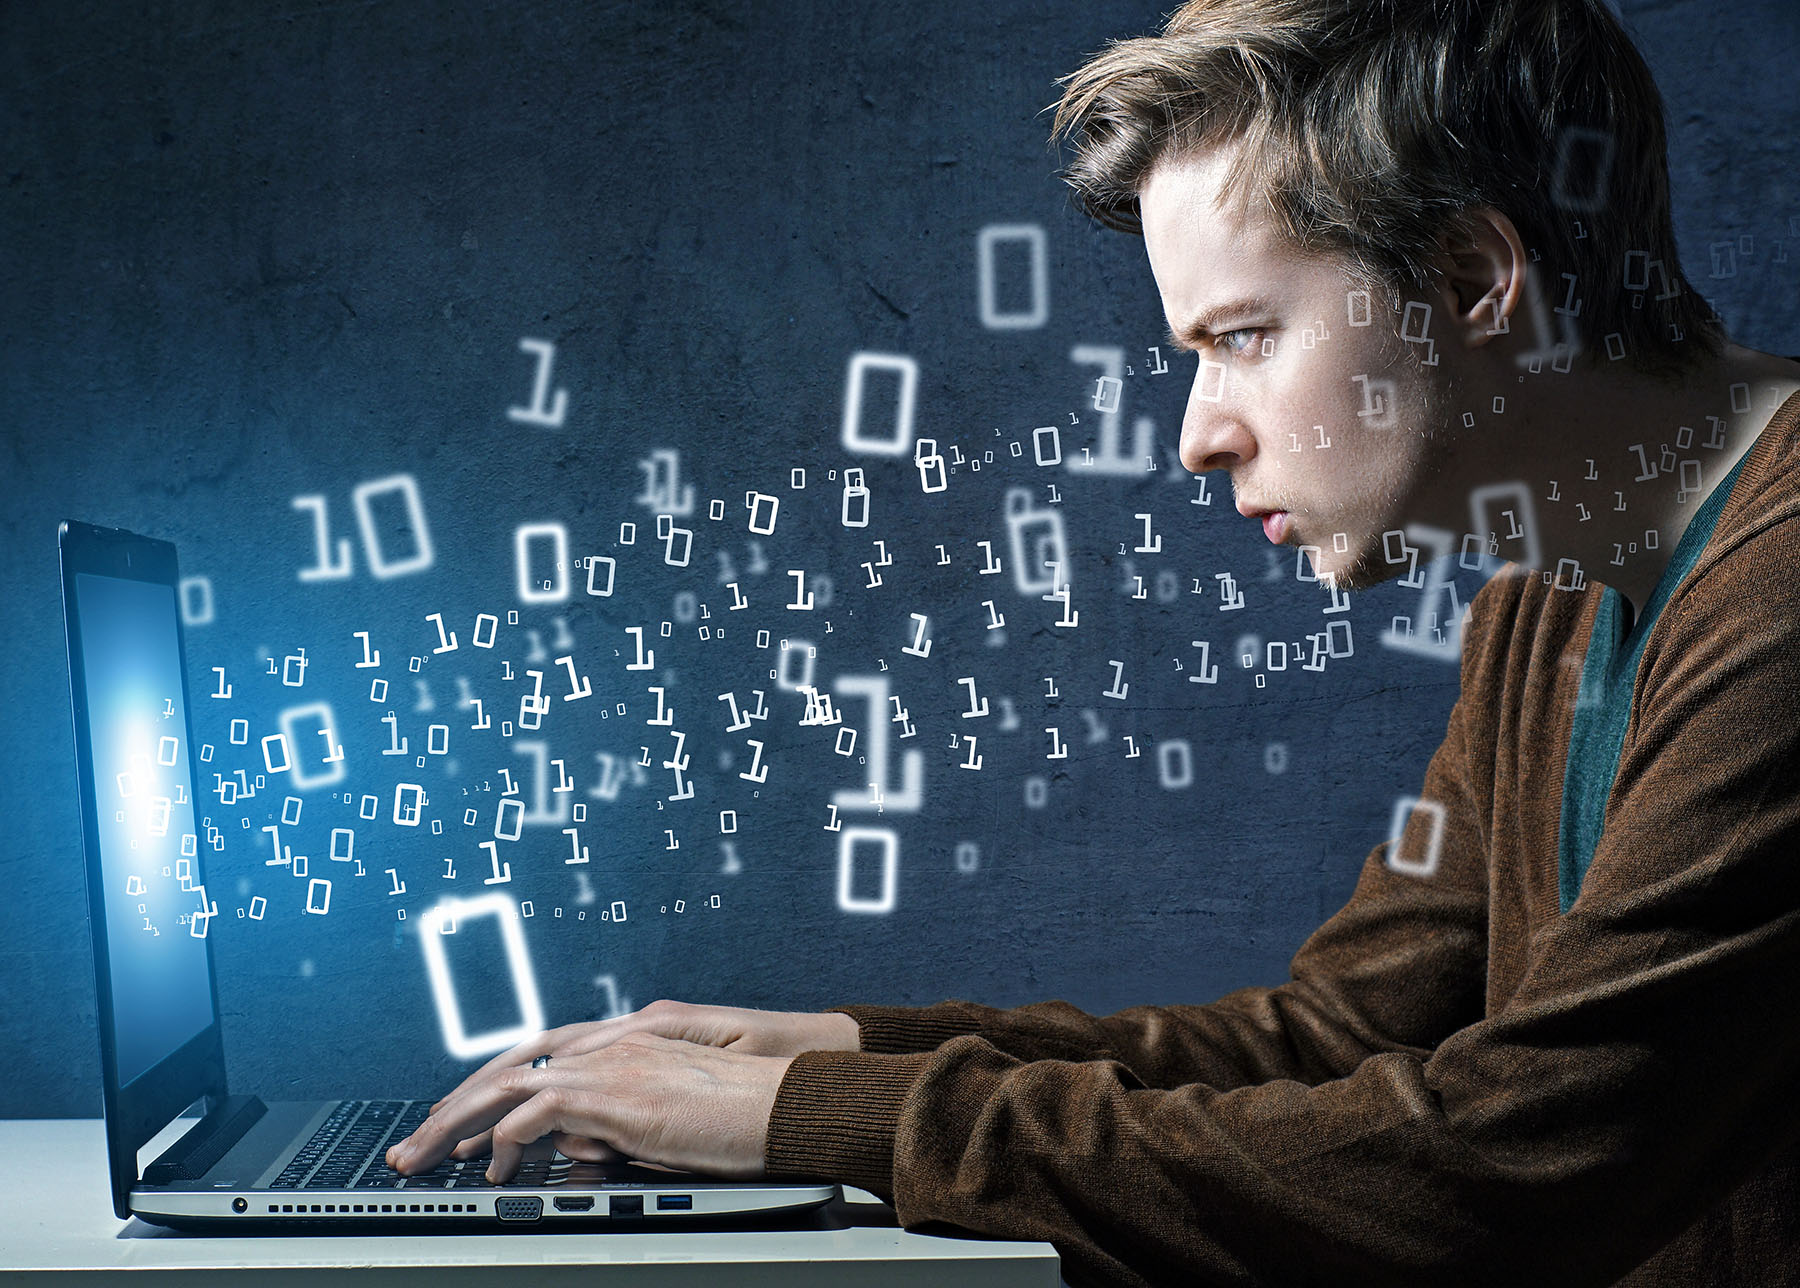 Картинки на тему компьютер и человек